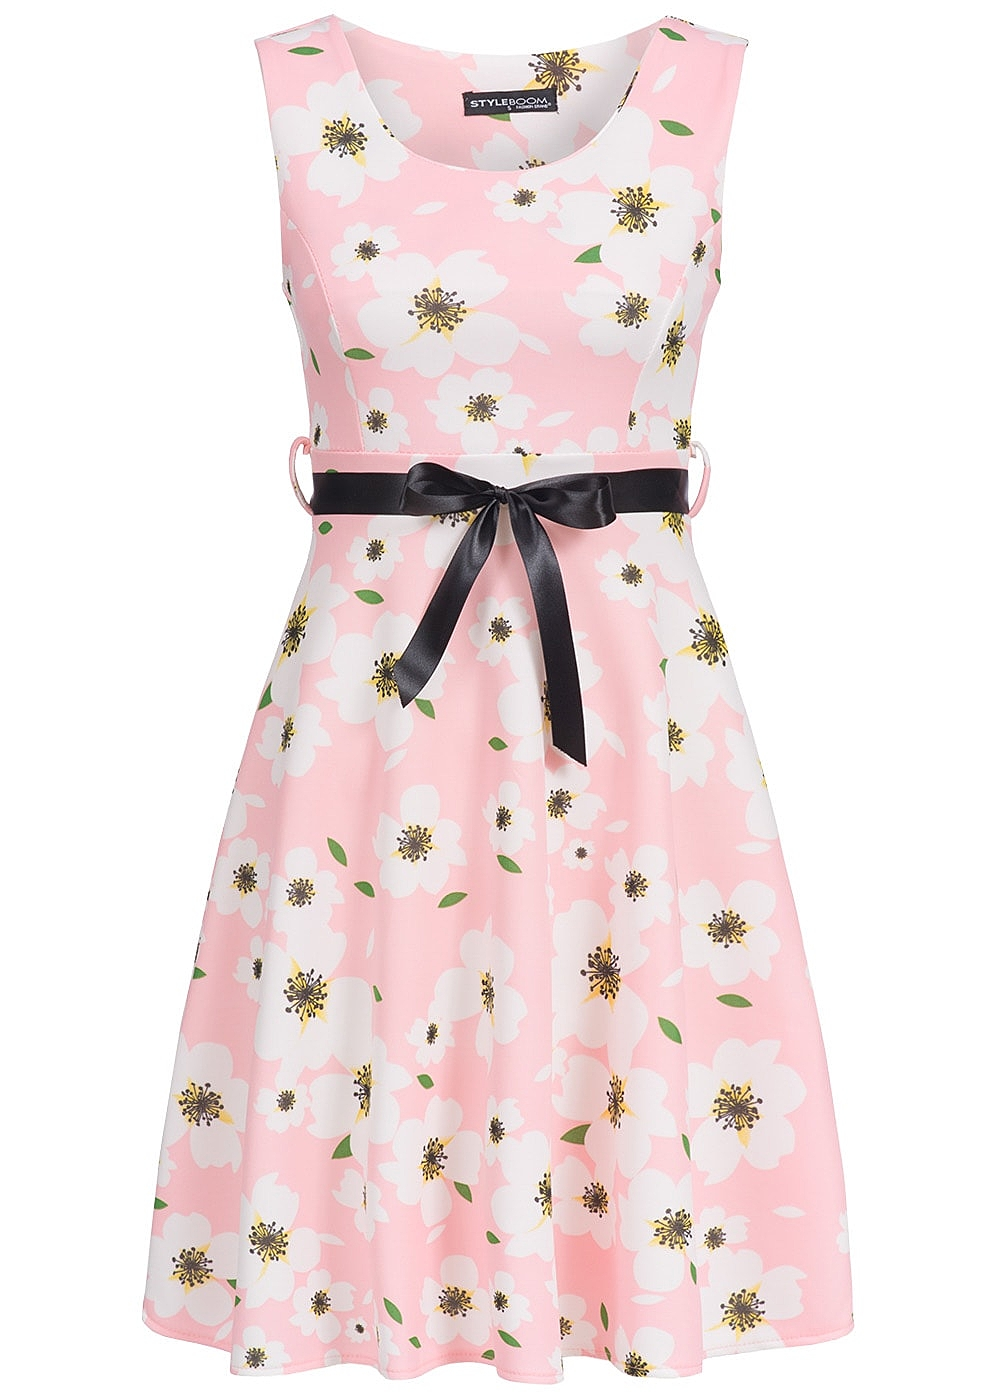 styleboom fashion damen medi kleid blumen muster bindeband rosa weiss 77onlineshop. Black Bedroom Furniture Sets. Home Design Ideas